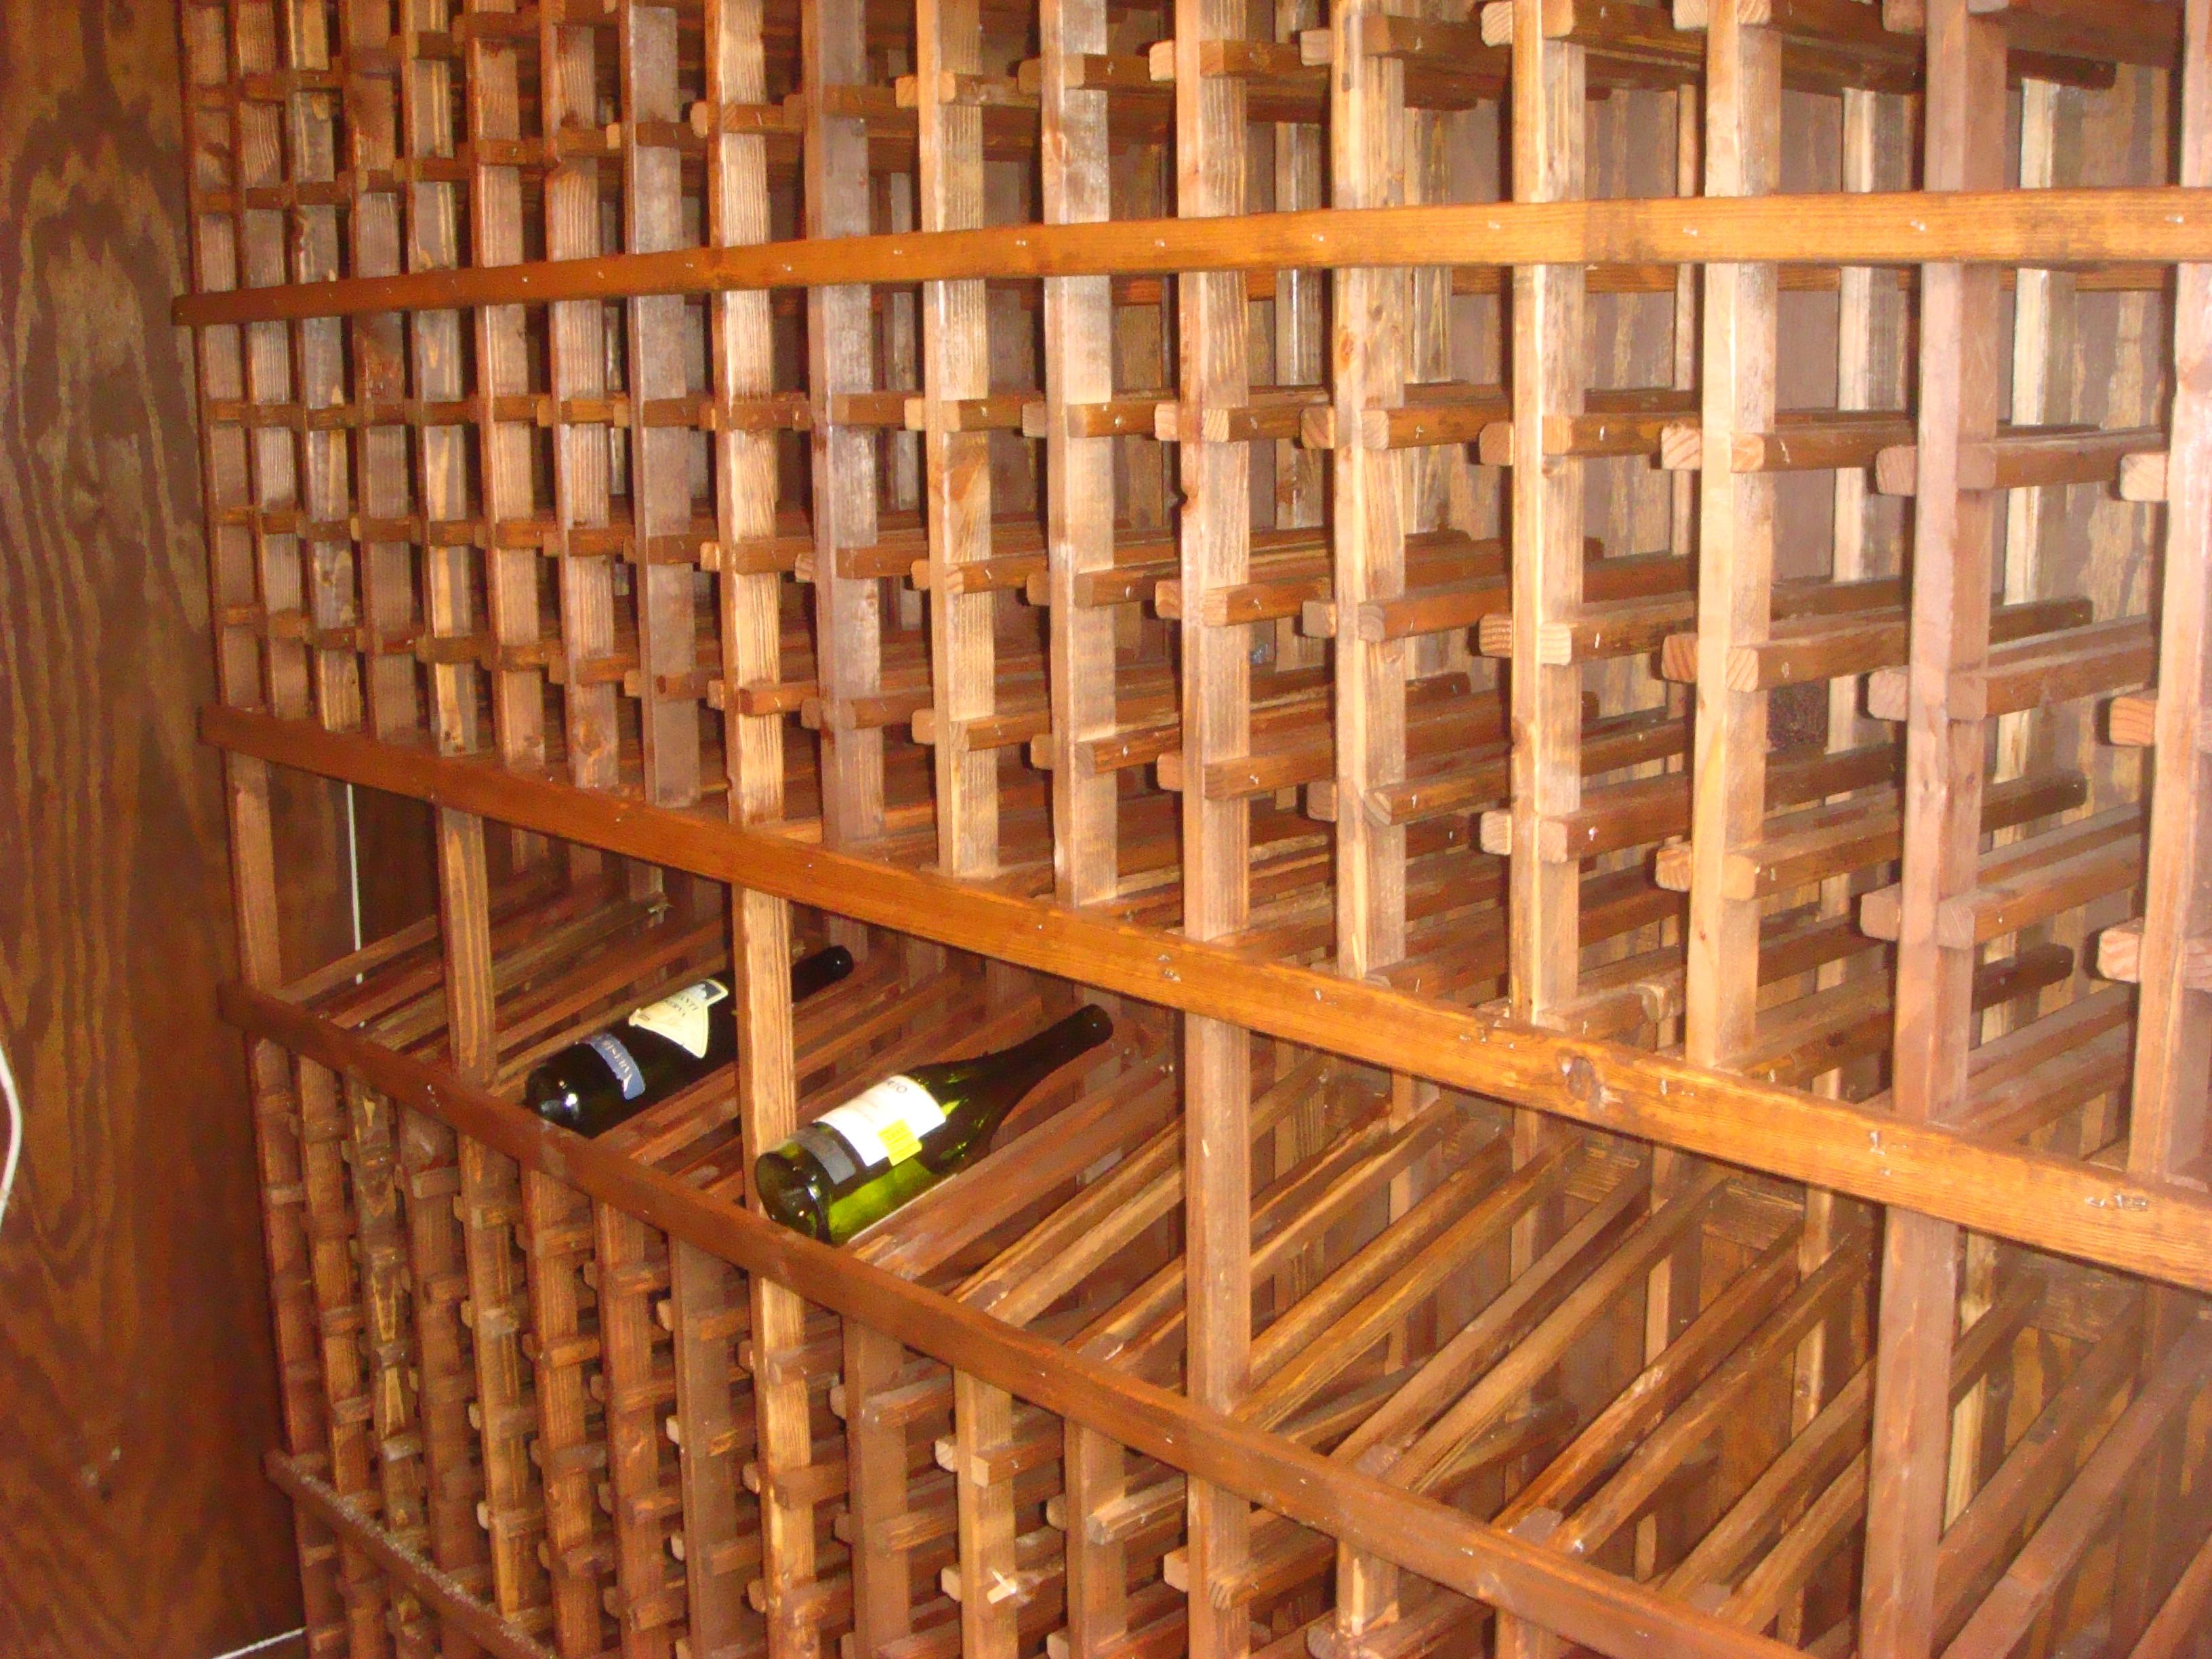 Best ideas about DIY Wine Racks Plan . Save or Pin Woodwork Diy Wine Cellar Rack Plans PDF Plans Now.